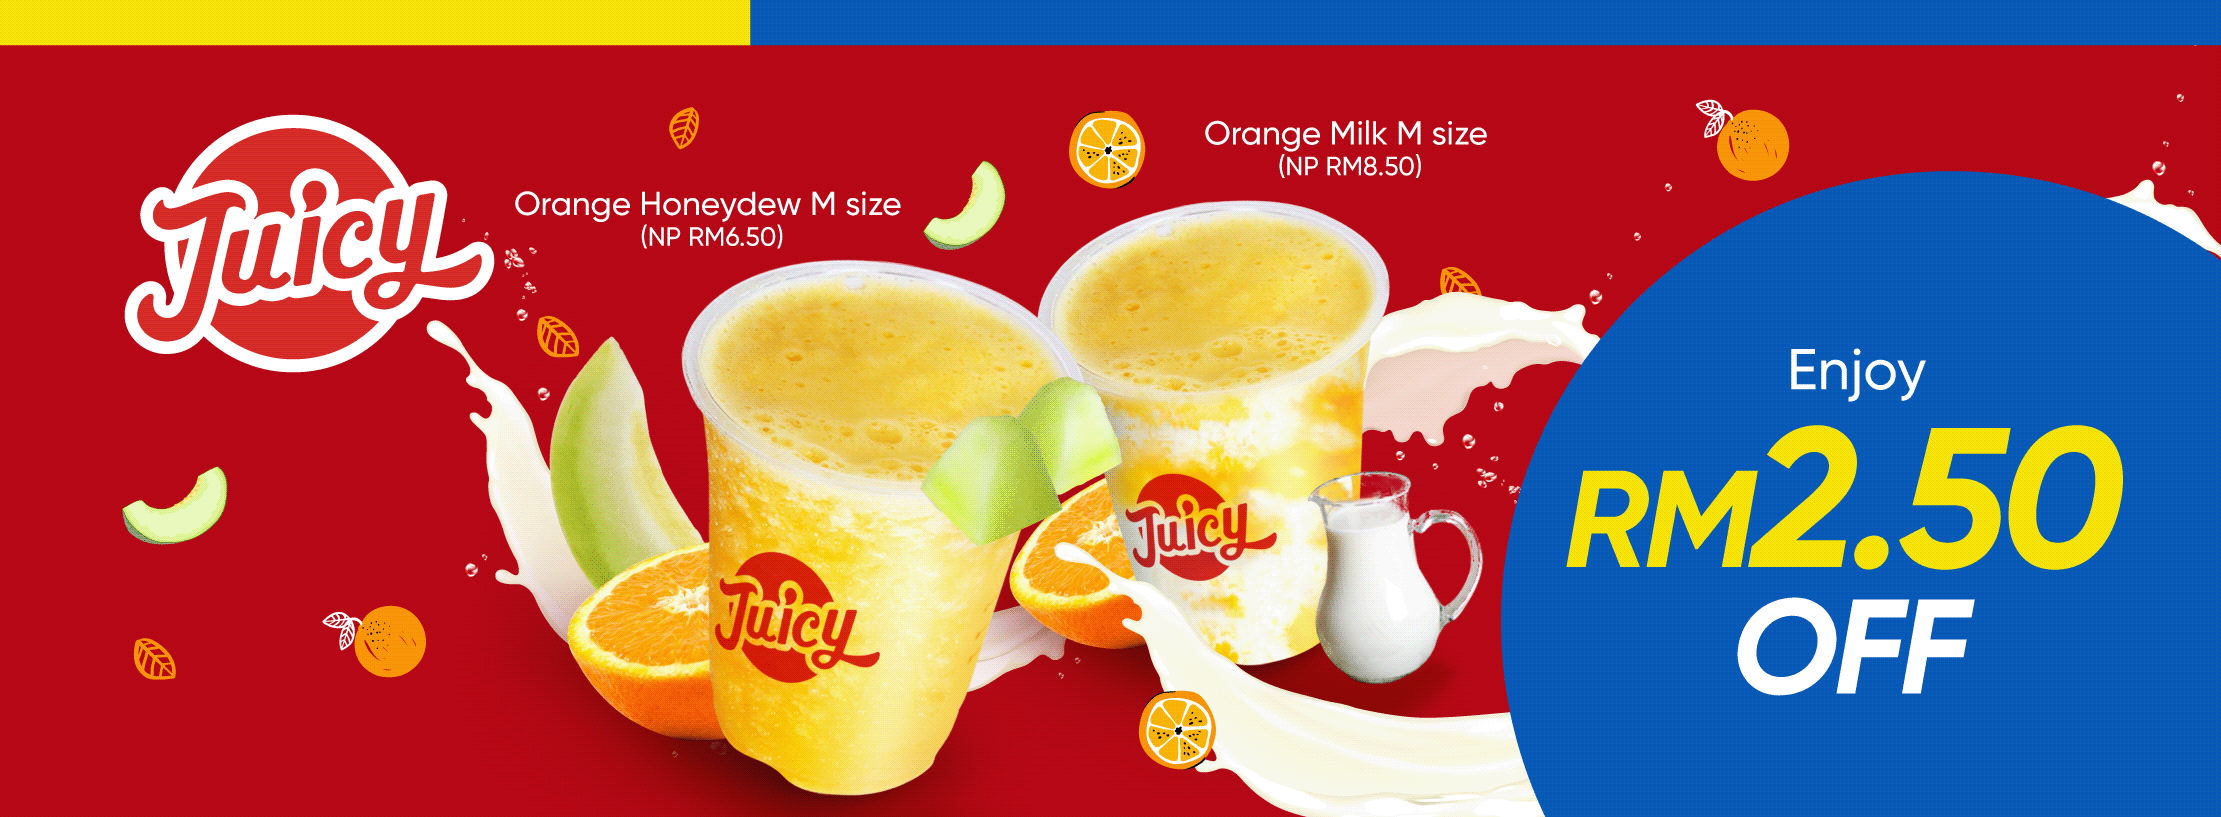 Juicy Fresh Juice Bar October Promotion